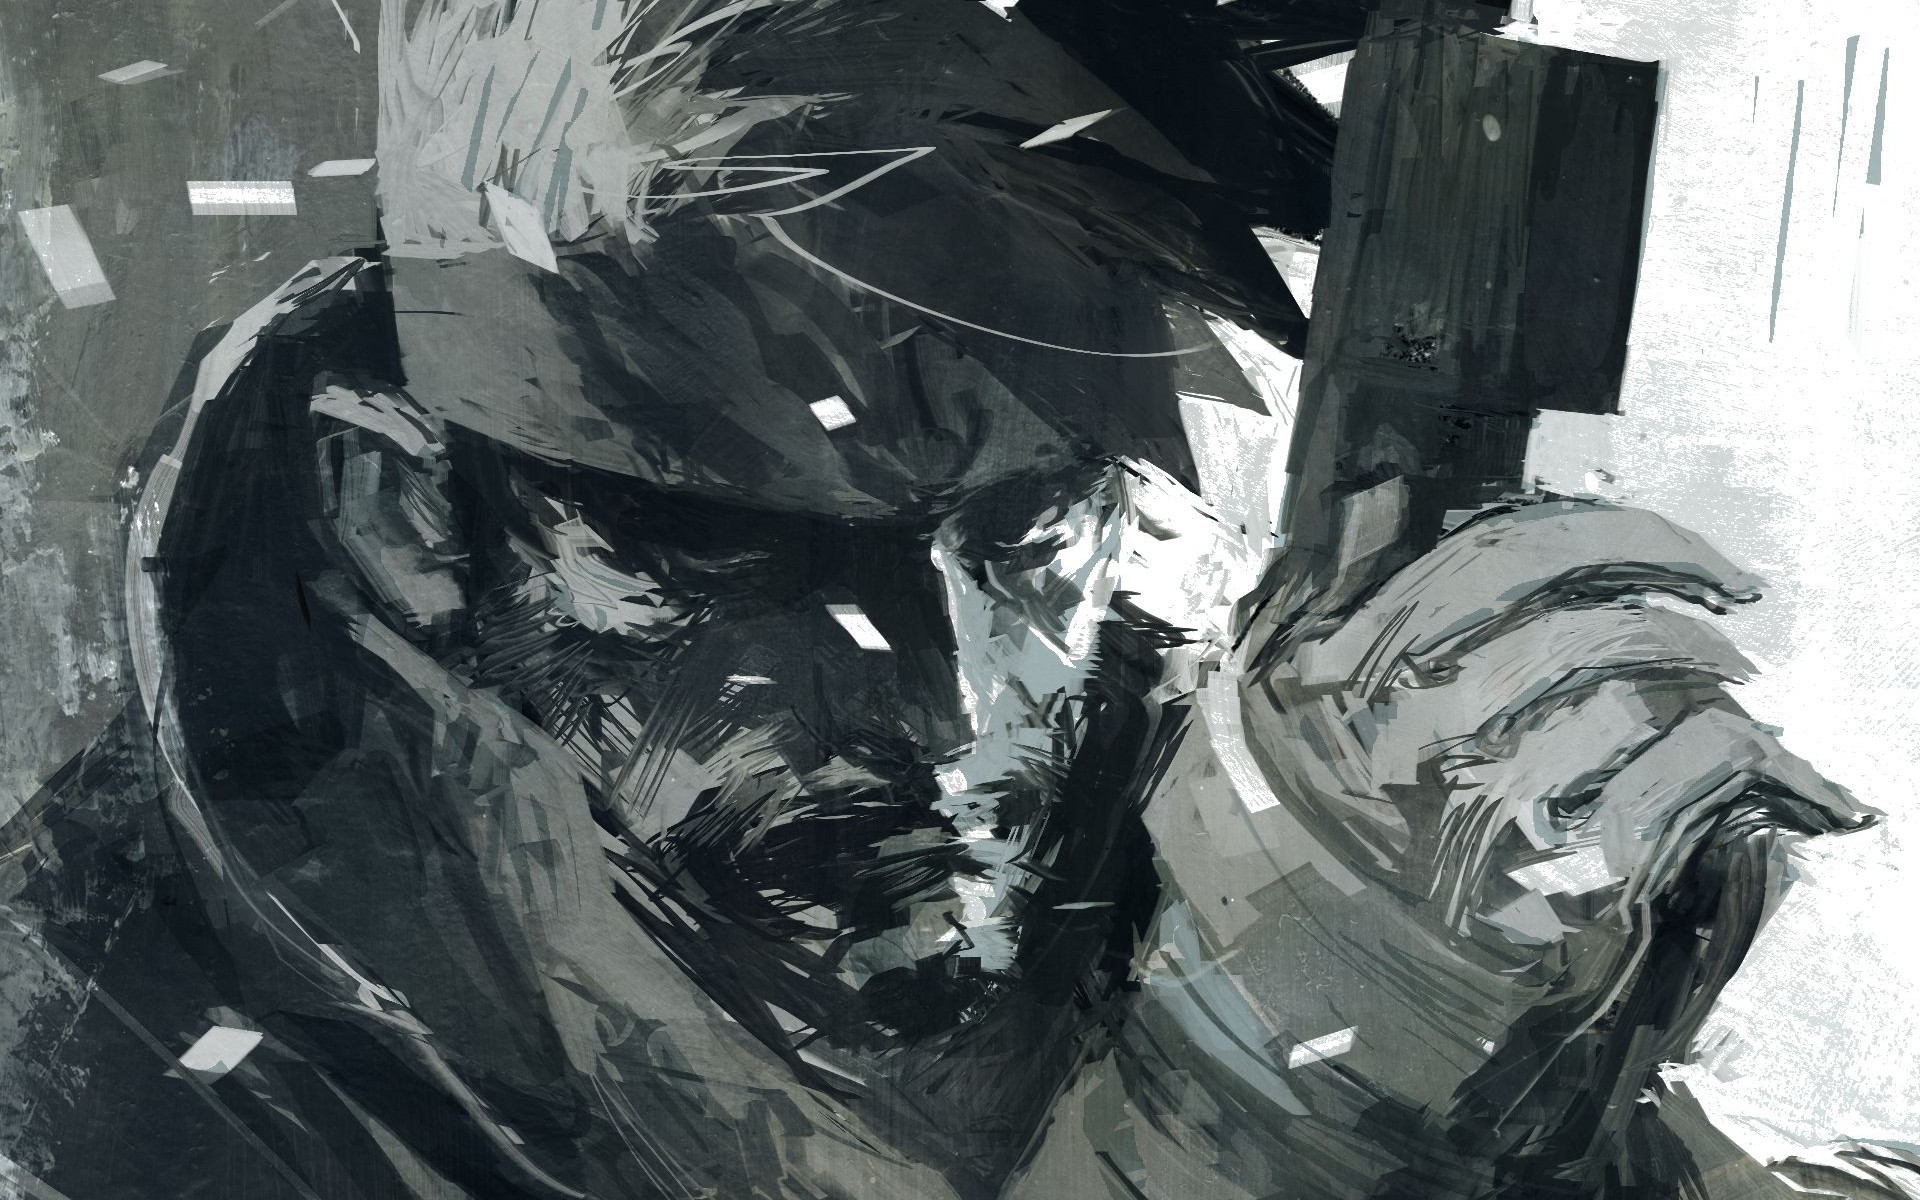 Metal Gear Solid wallpaper #14781